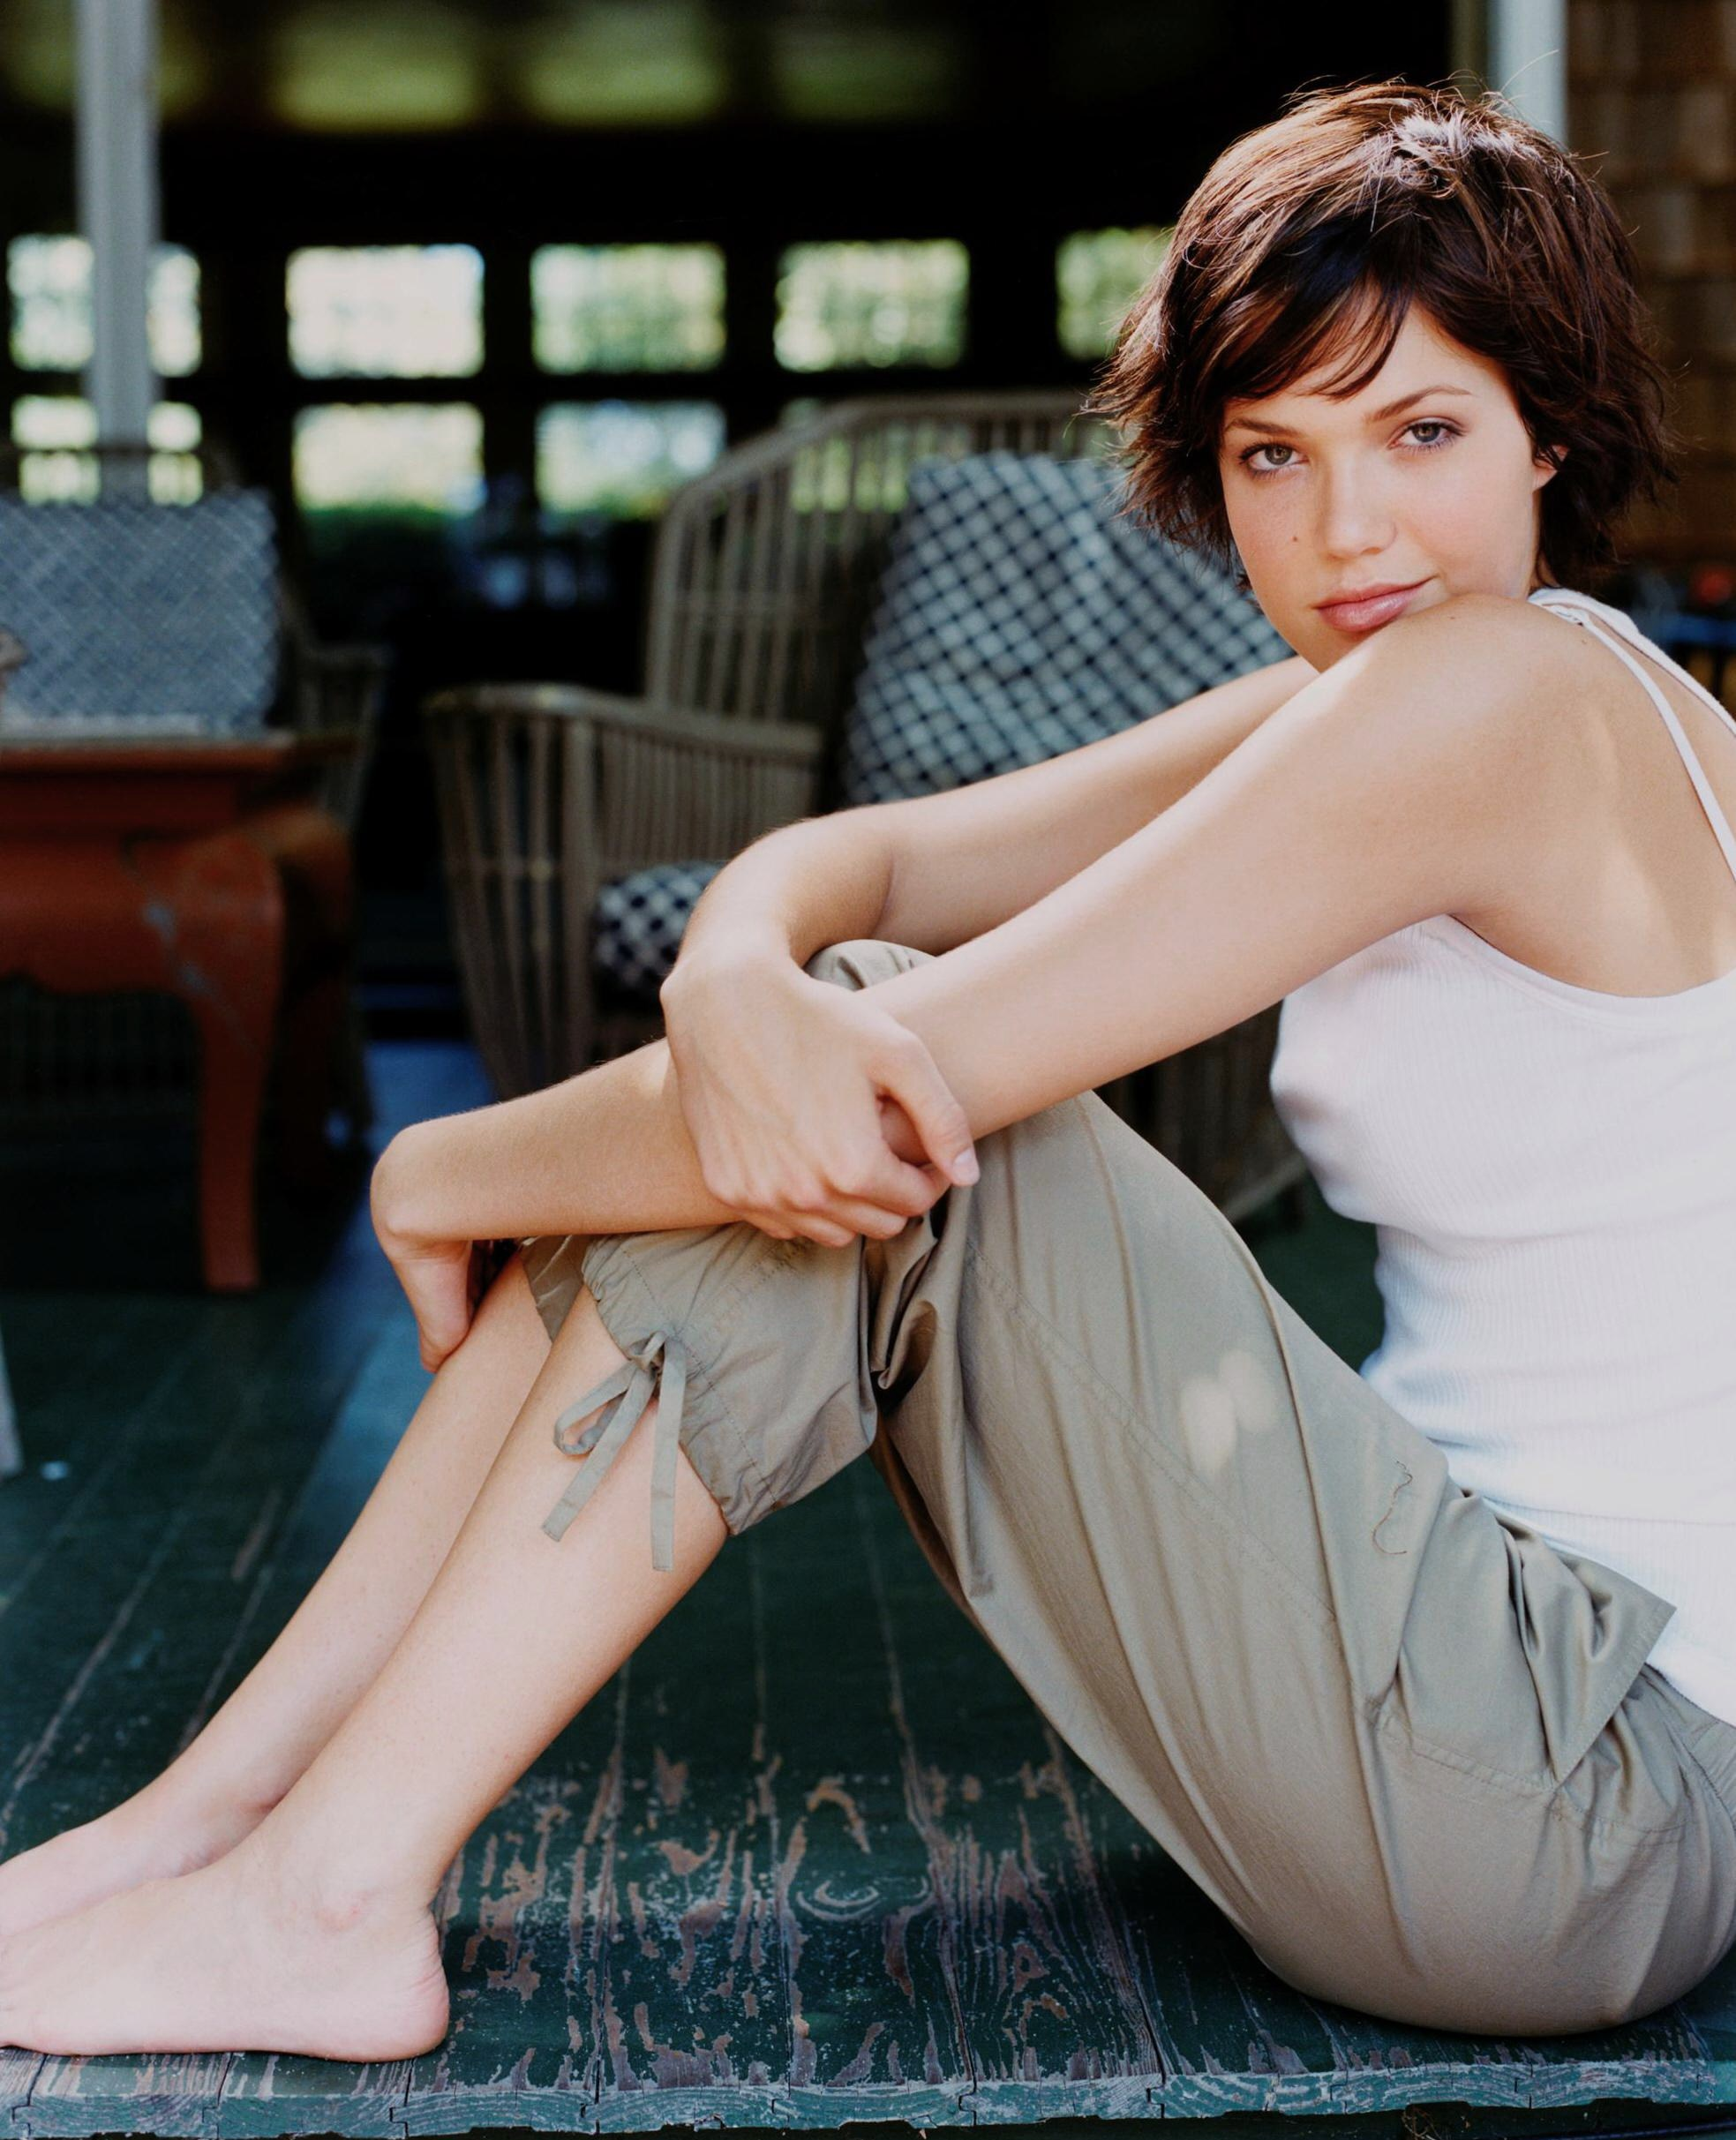 https://pics.wikifeet.com/Mandy-Moore-Feet-582054.jpg